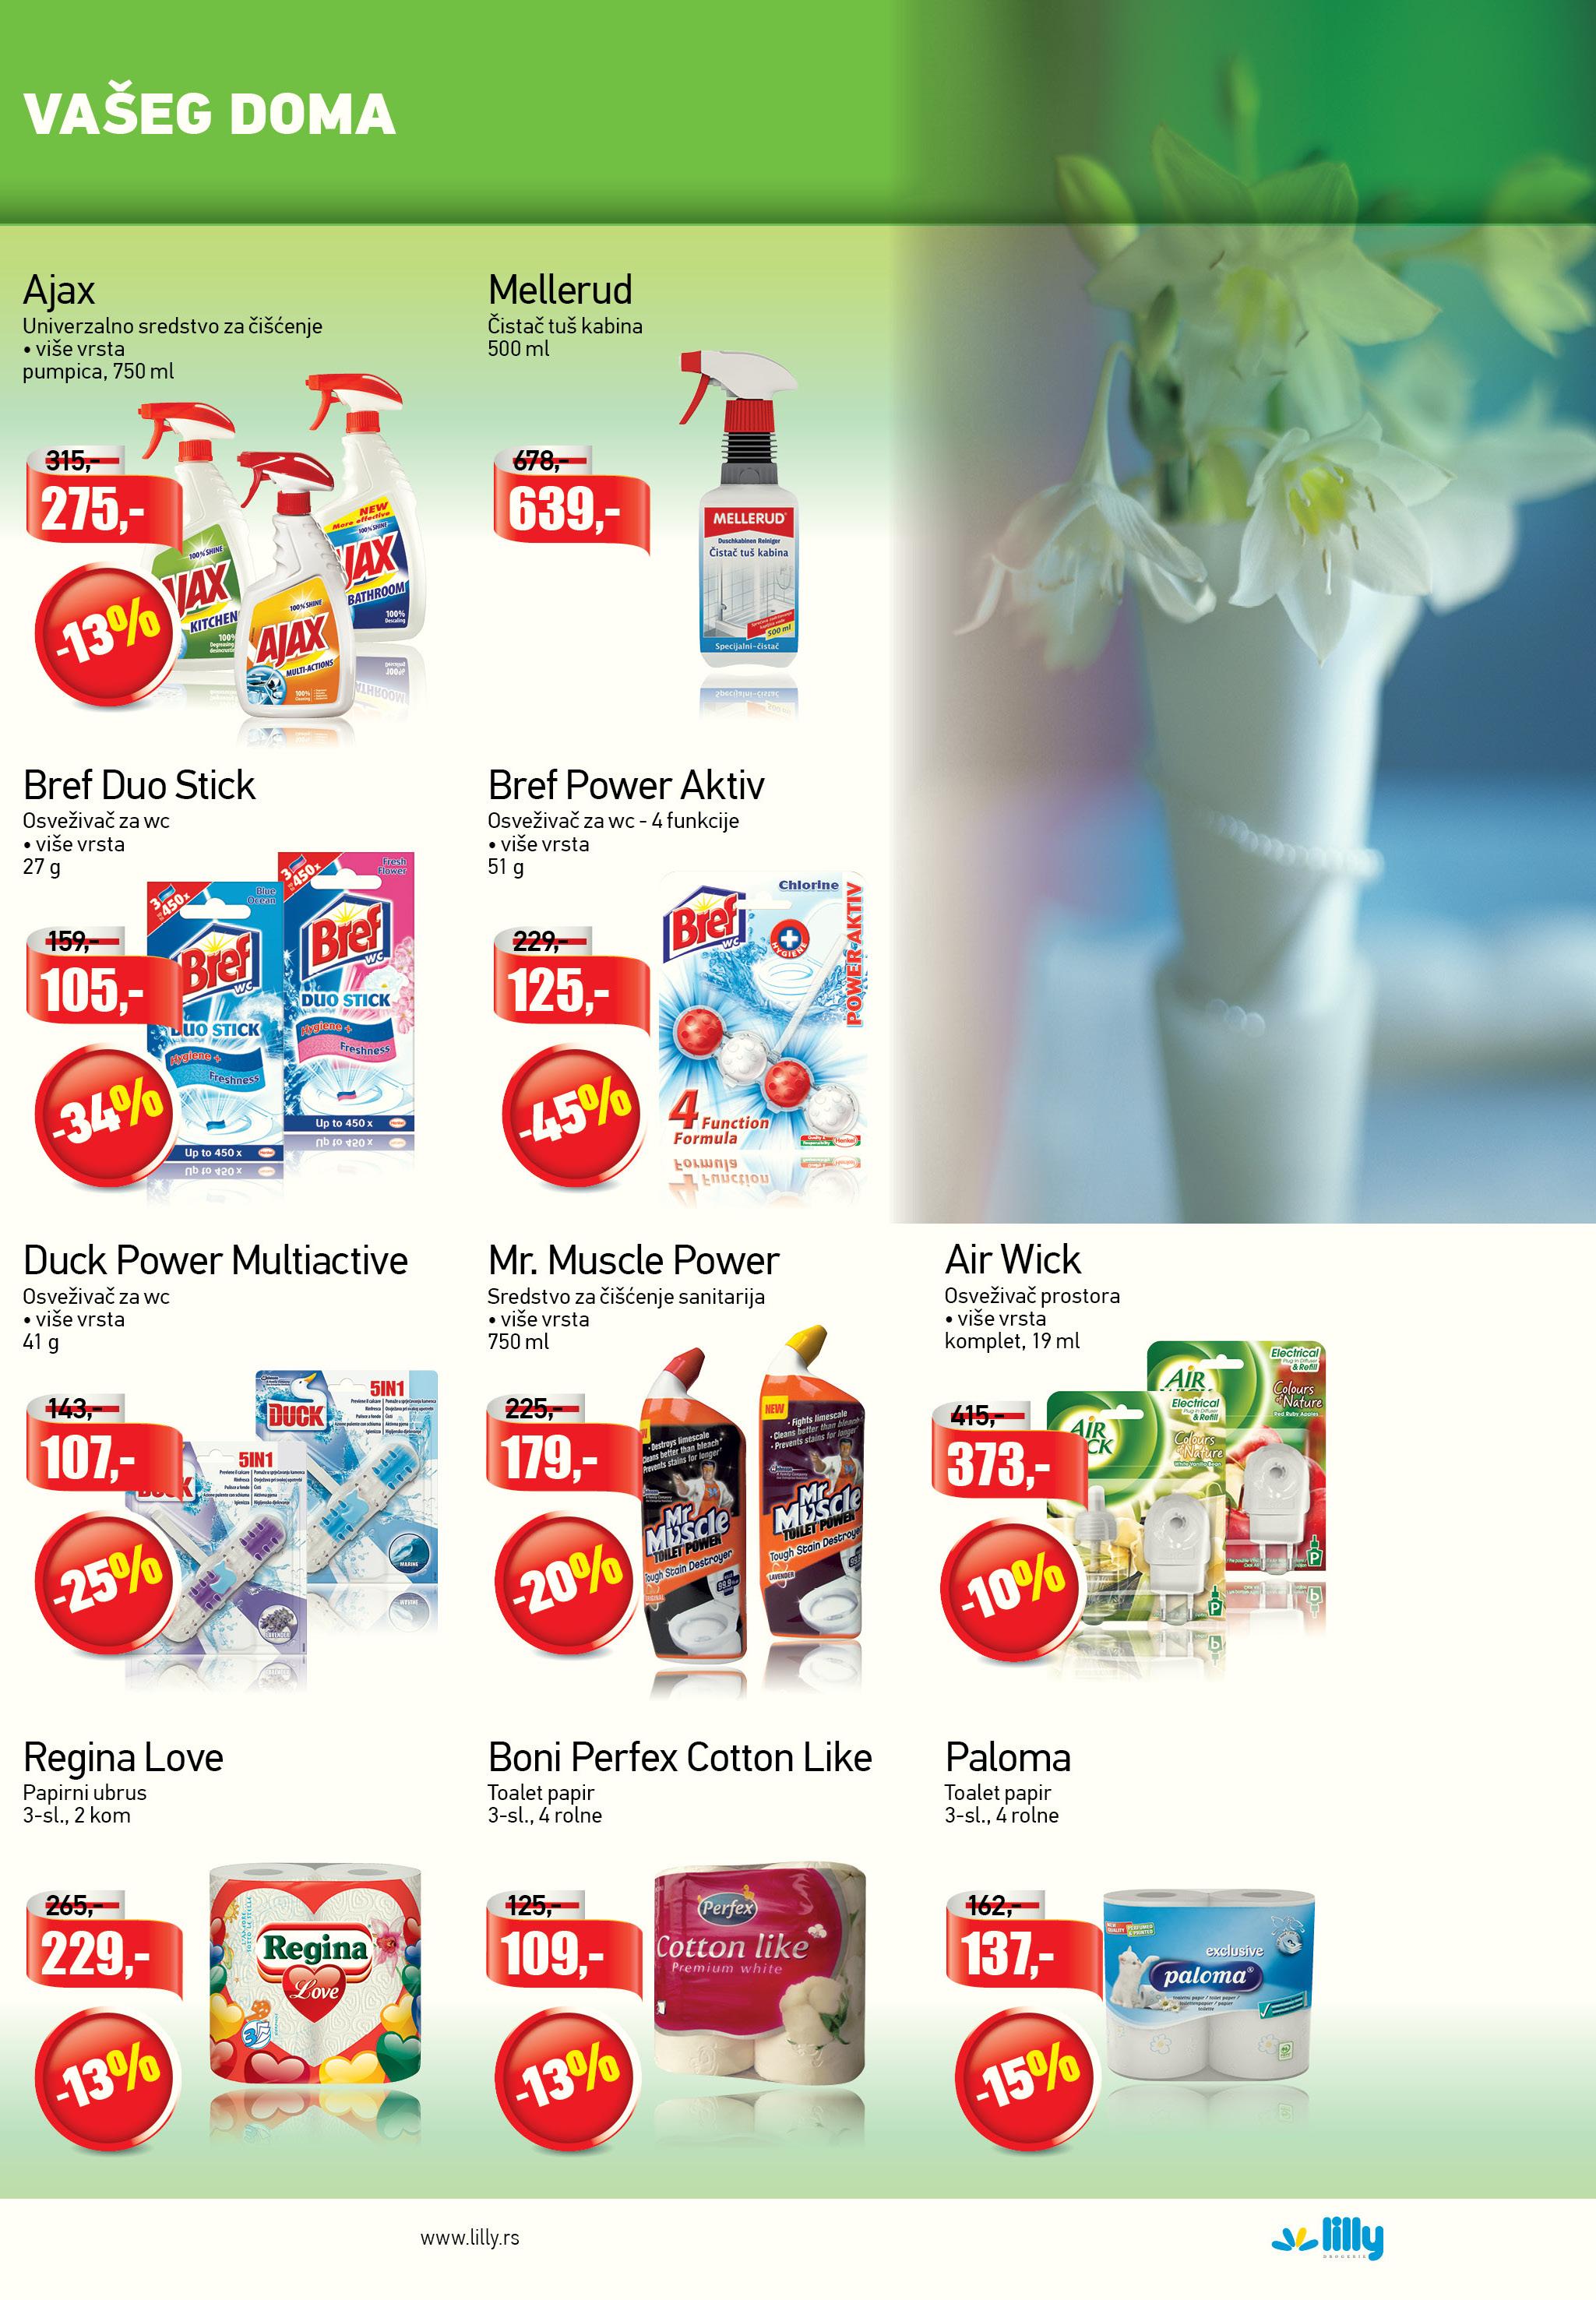 Lilly katalog super ponude